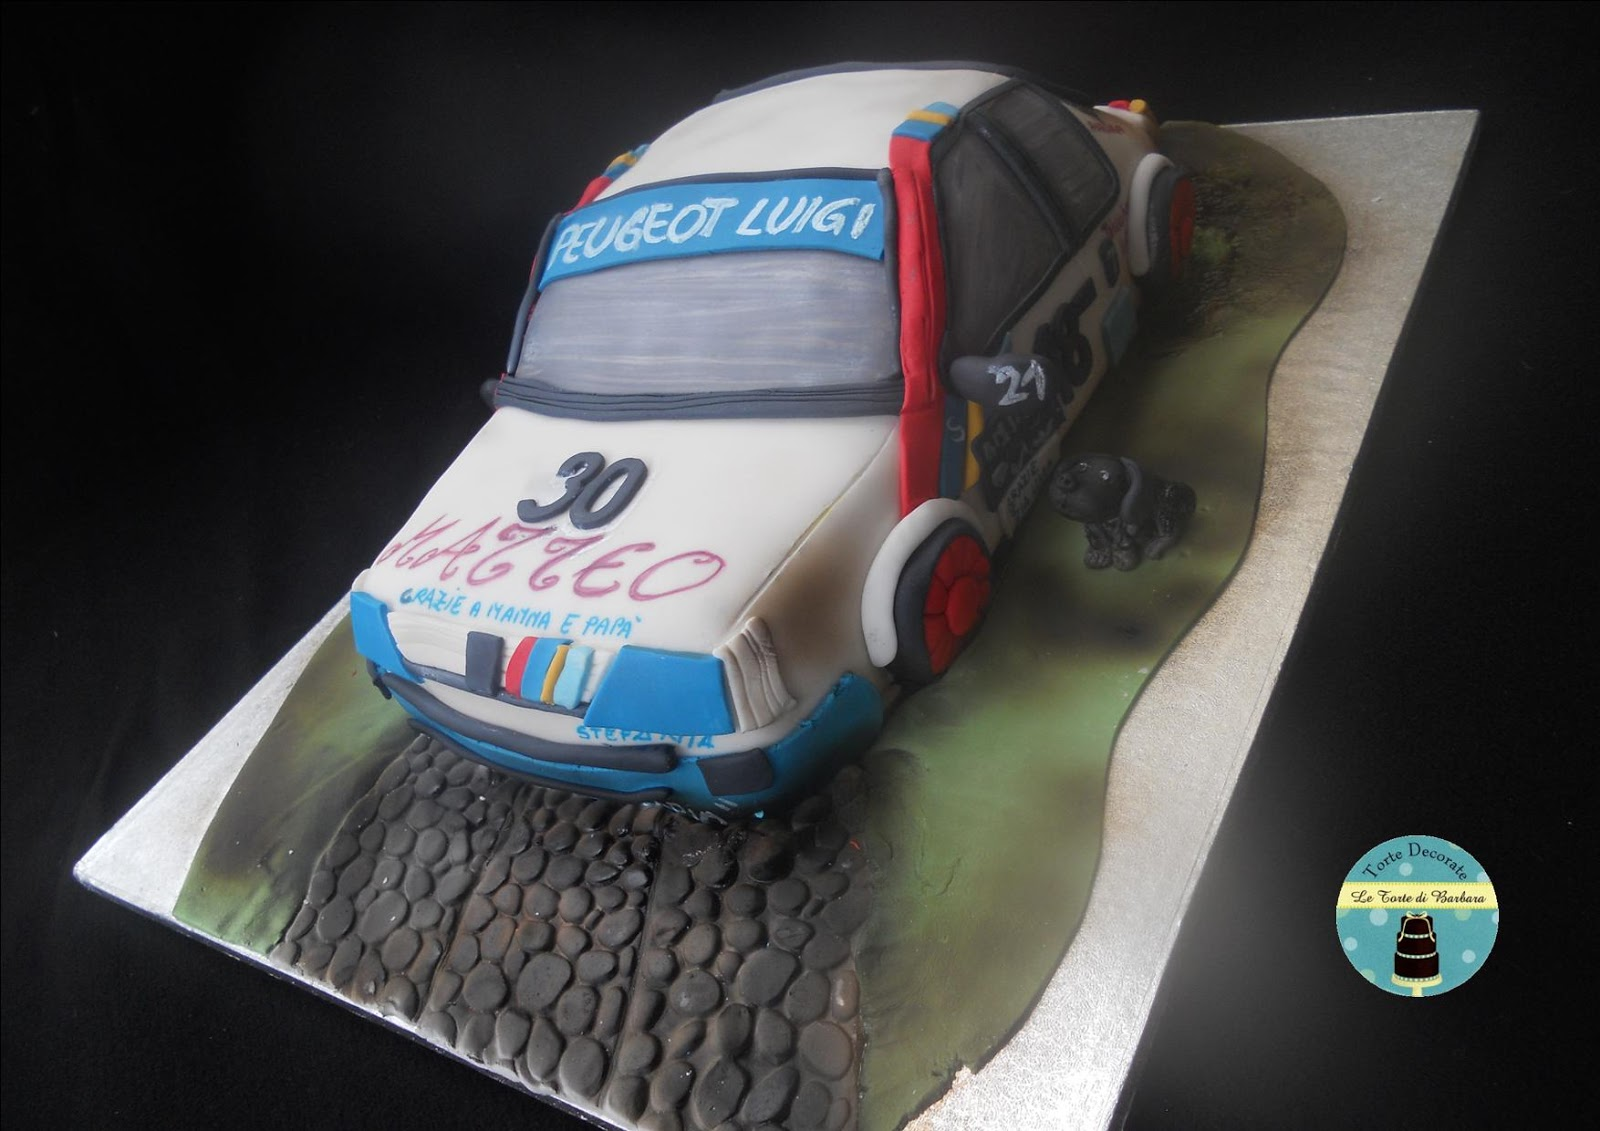 Letto A Forma Di Macchina Da Corsa : Le torte di barbara: torta macchina da corsa